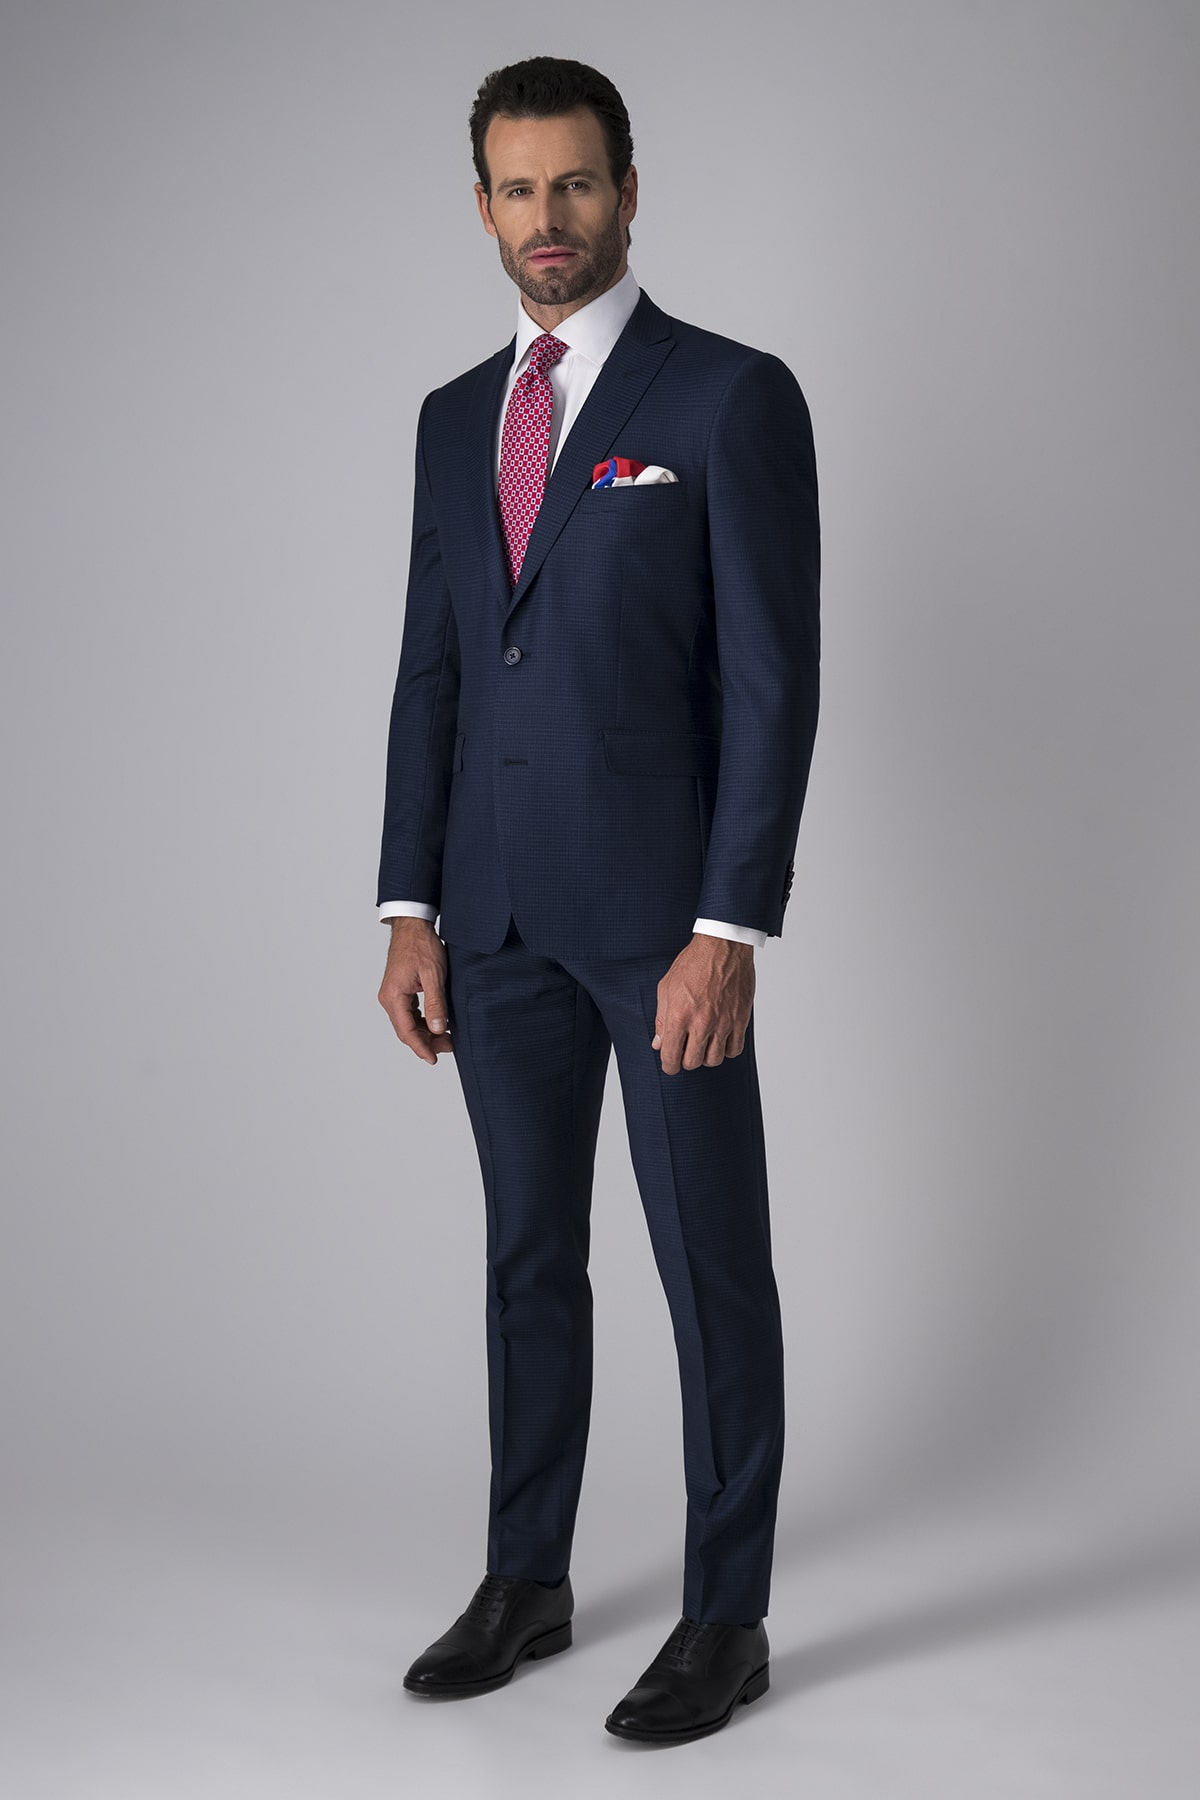 Traje Robert´s Red, slim fit, azul a cuadros, lana stretch